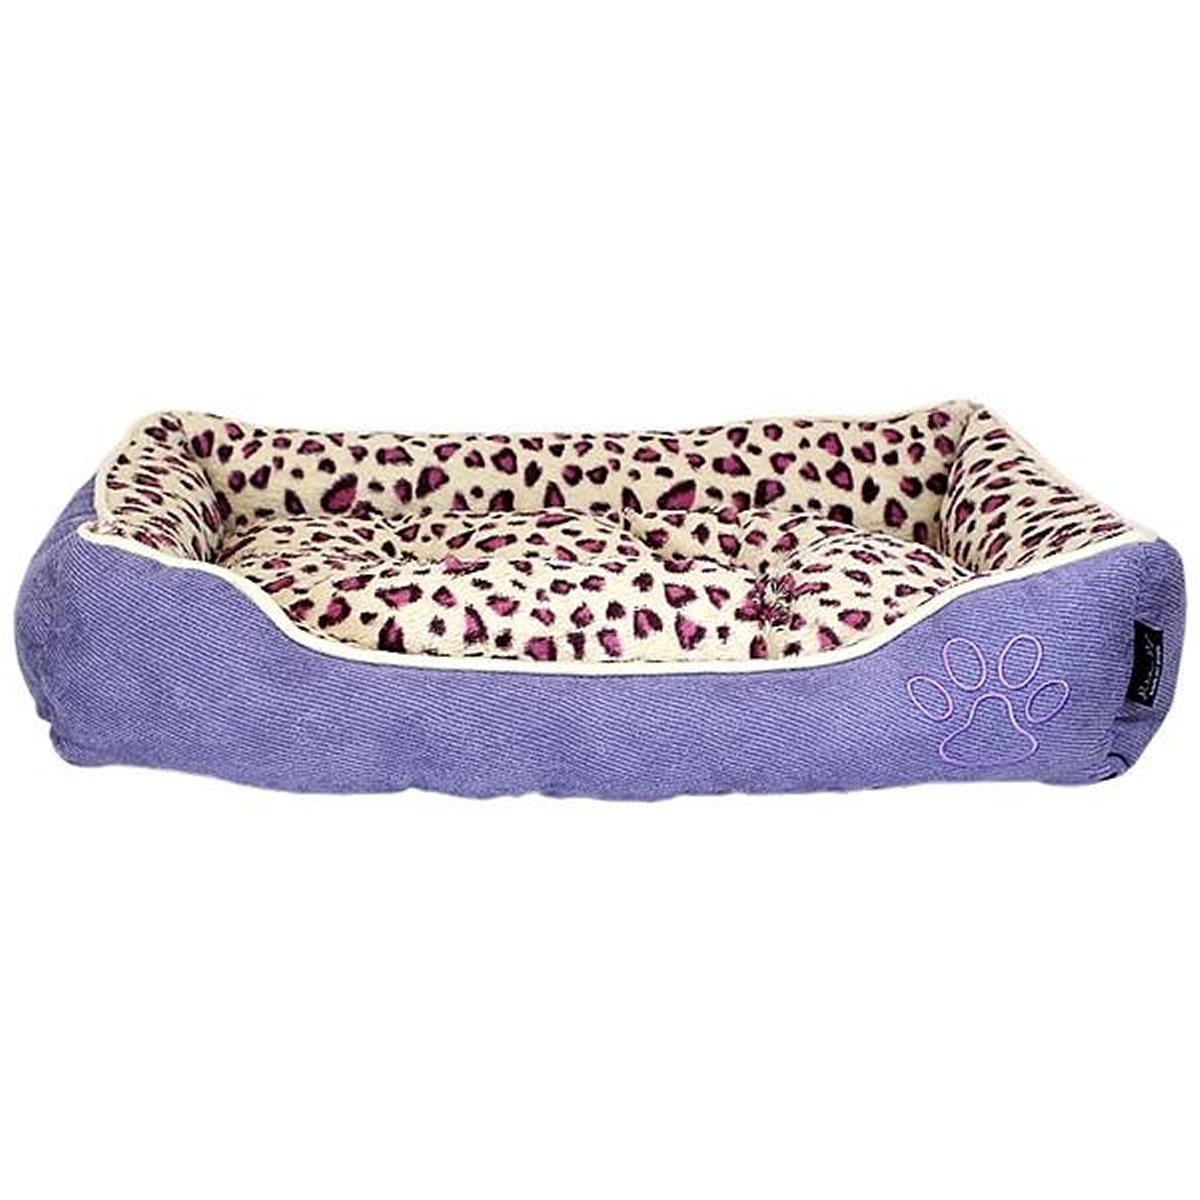 Parisian Pet Safari Lounger Dog Bed - Purple